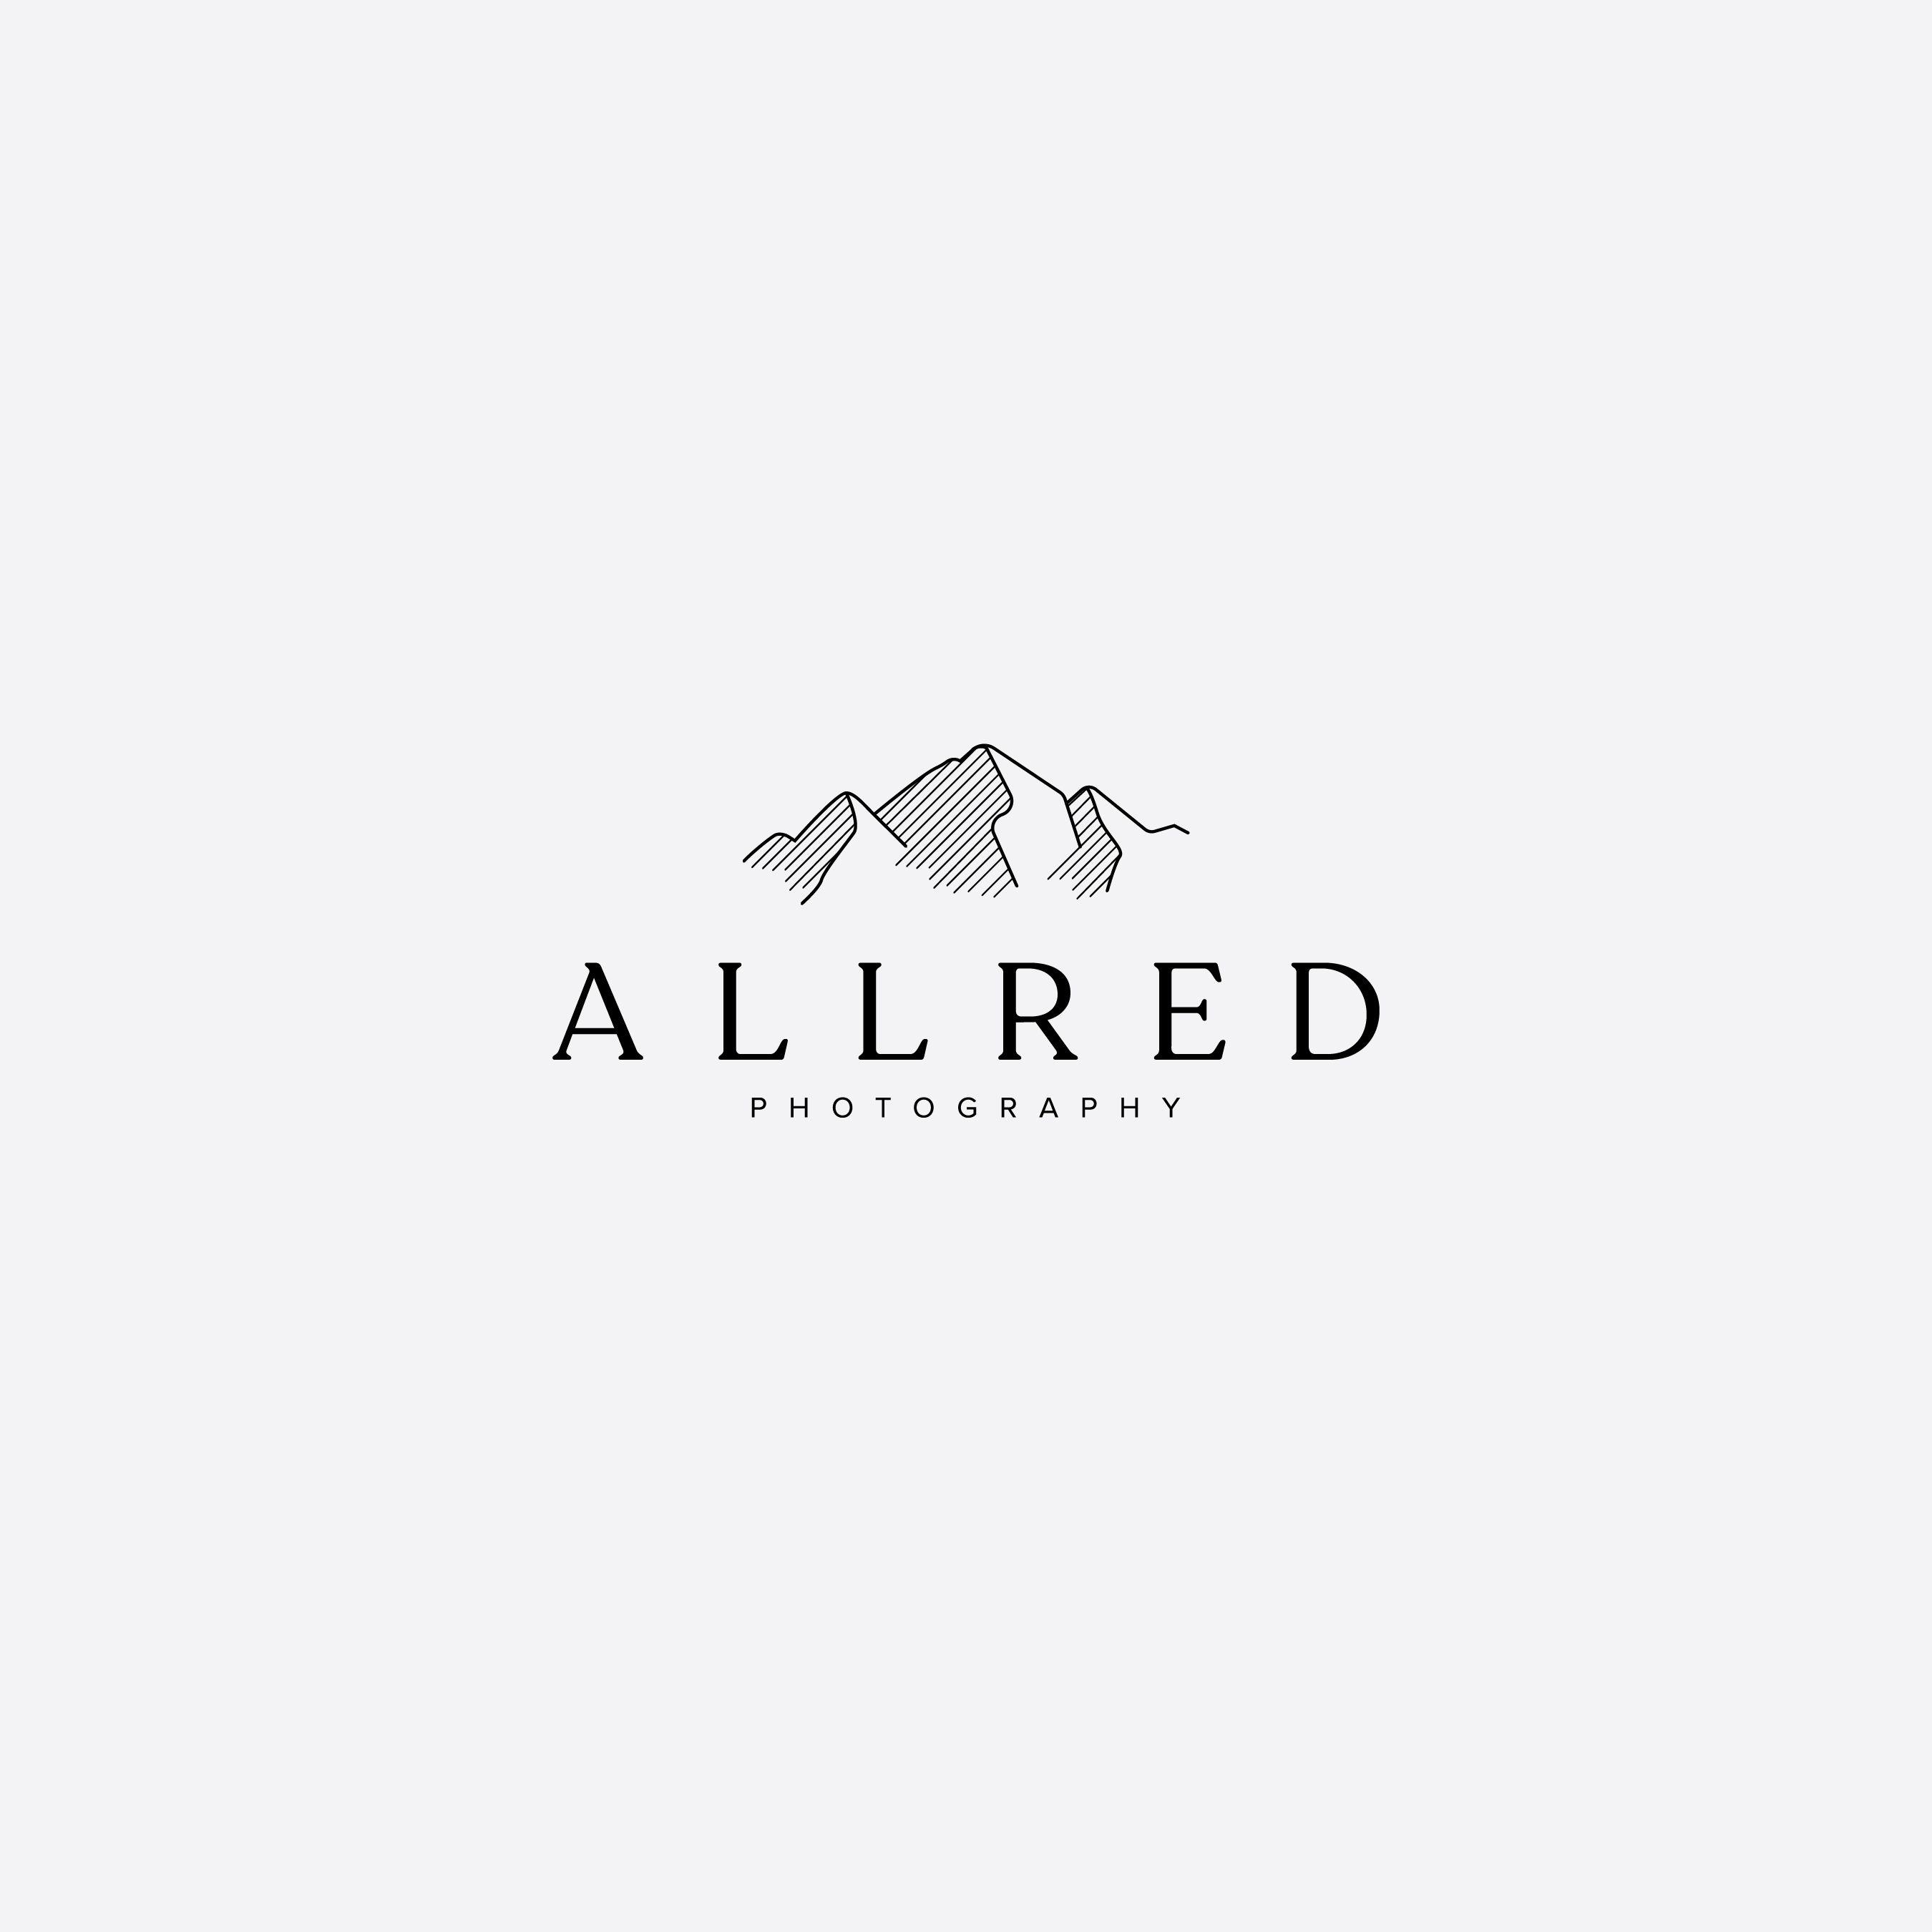 Simple And Modern Logo And Logo Mark With Mountains Modern Serif Typography Mixed With Sans Serif Li Simple Logo Design Branding Design Studio Adventure Logo